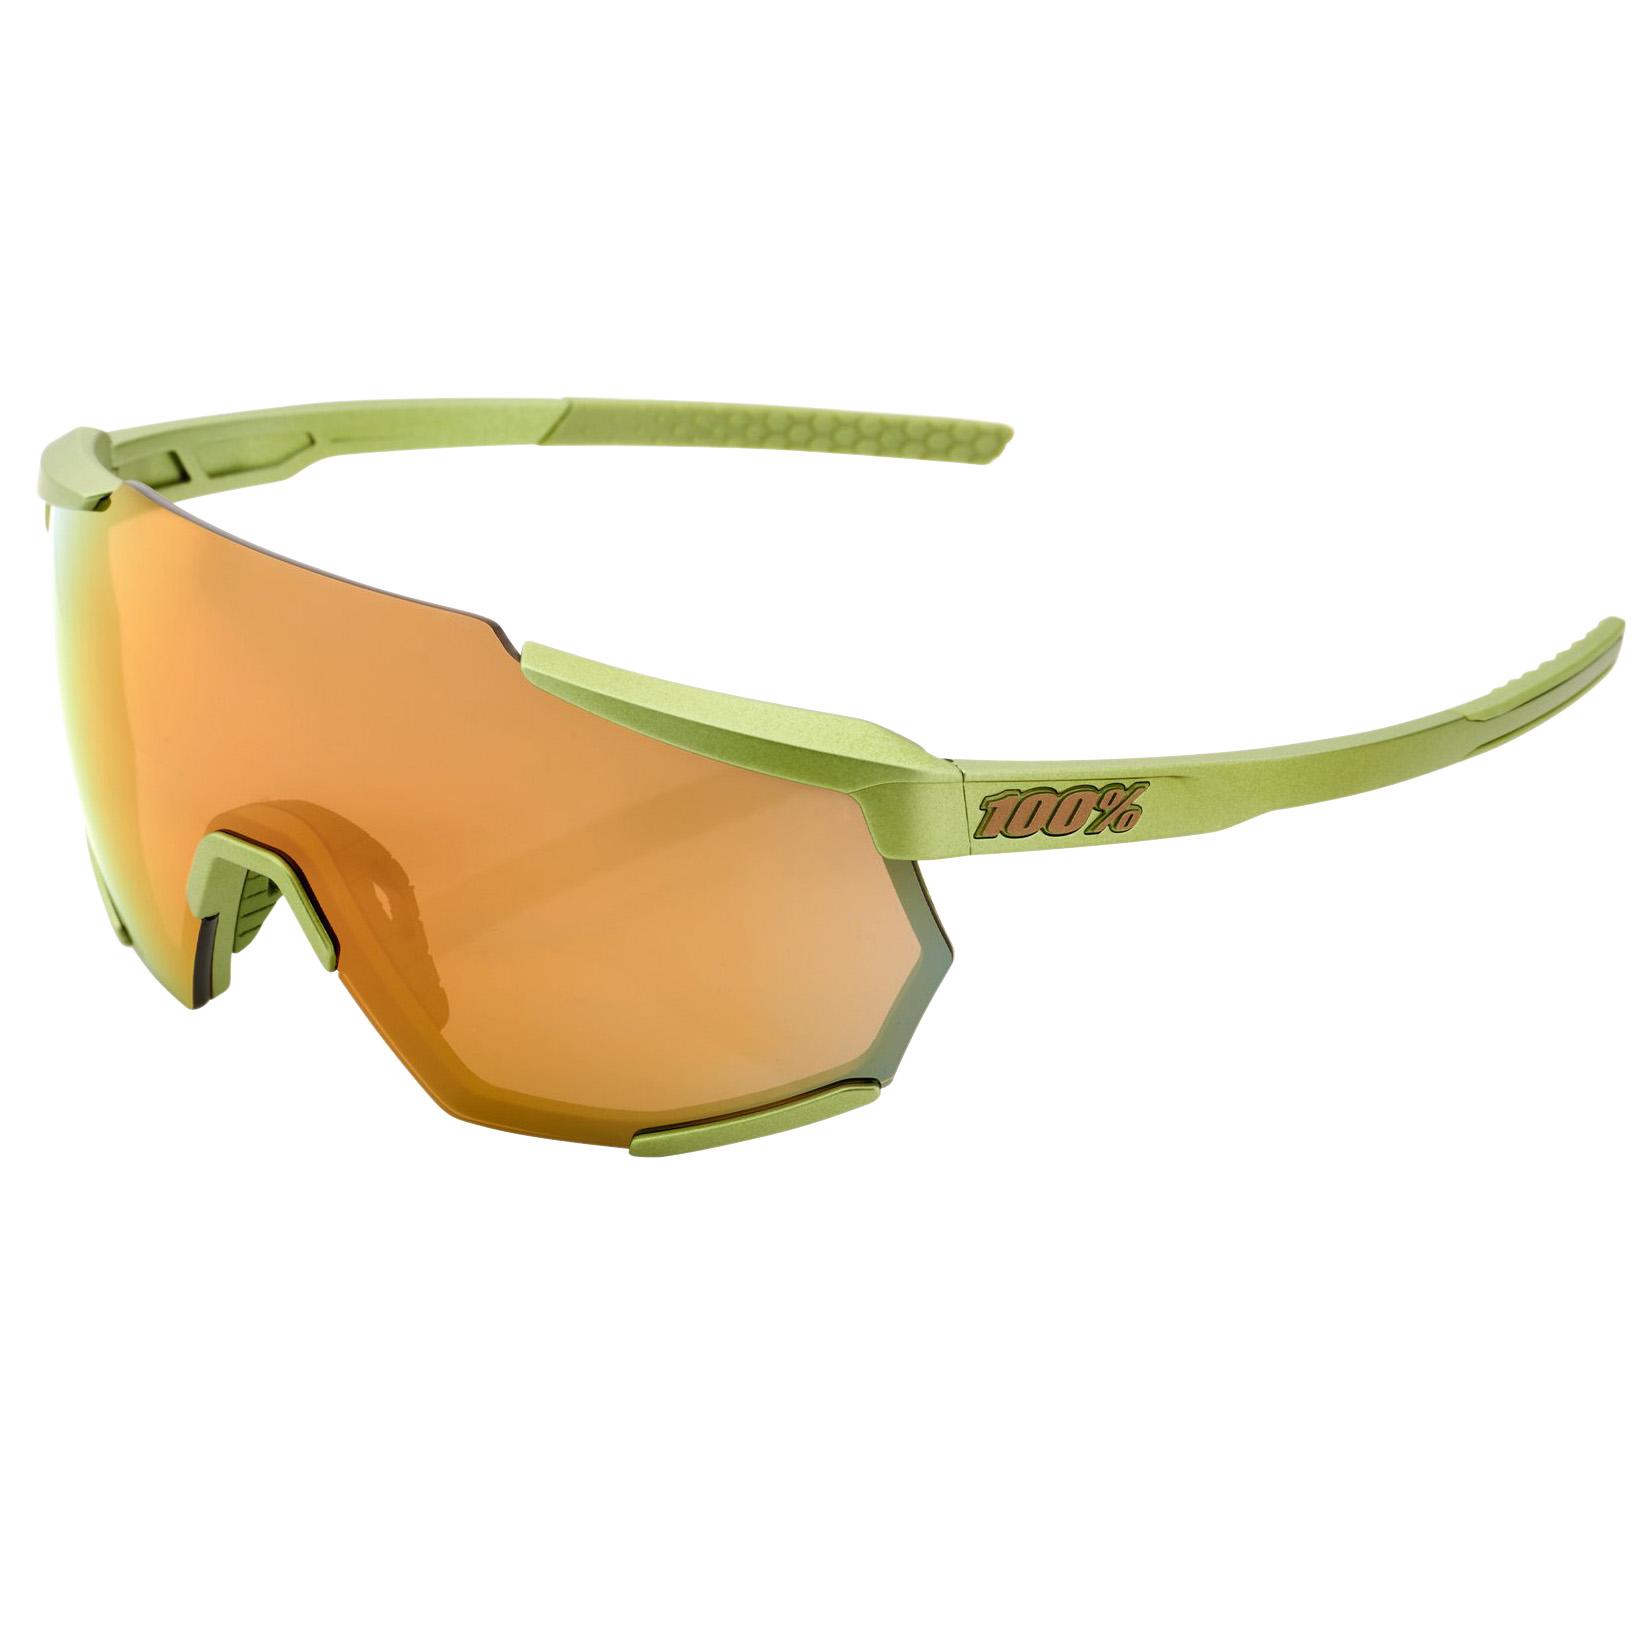 100% Racetrap Mirror Gafas - Matte Metallic Viperidae/Bronze Multilayer + Clear